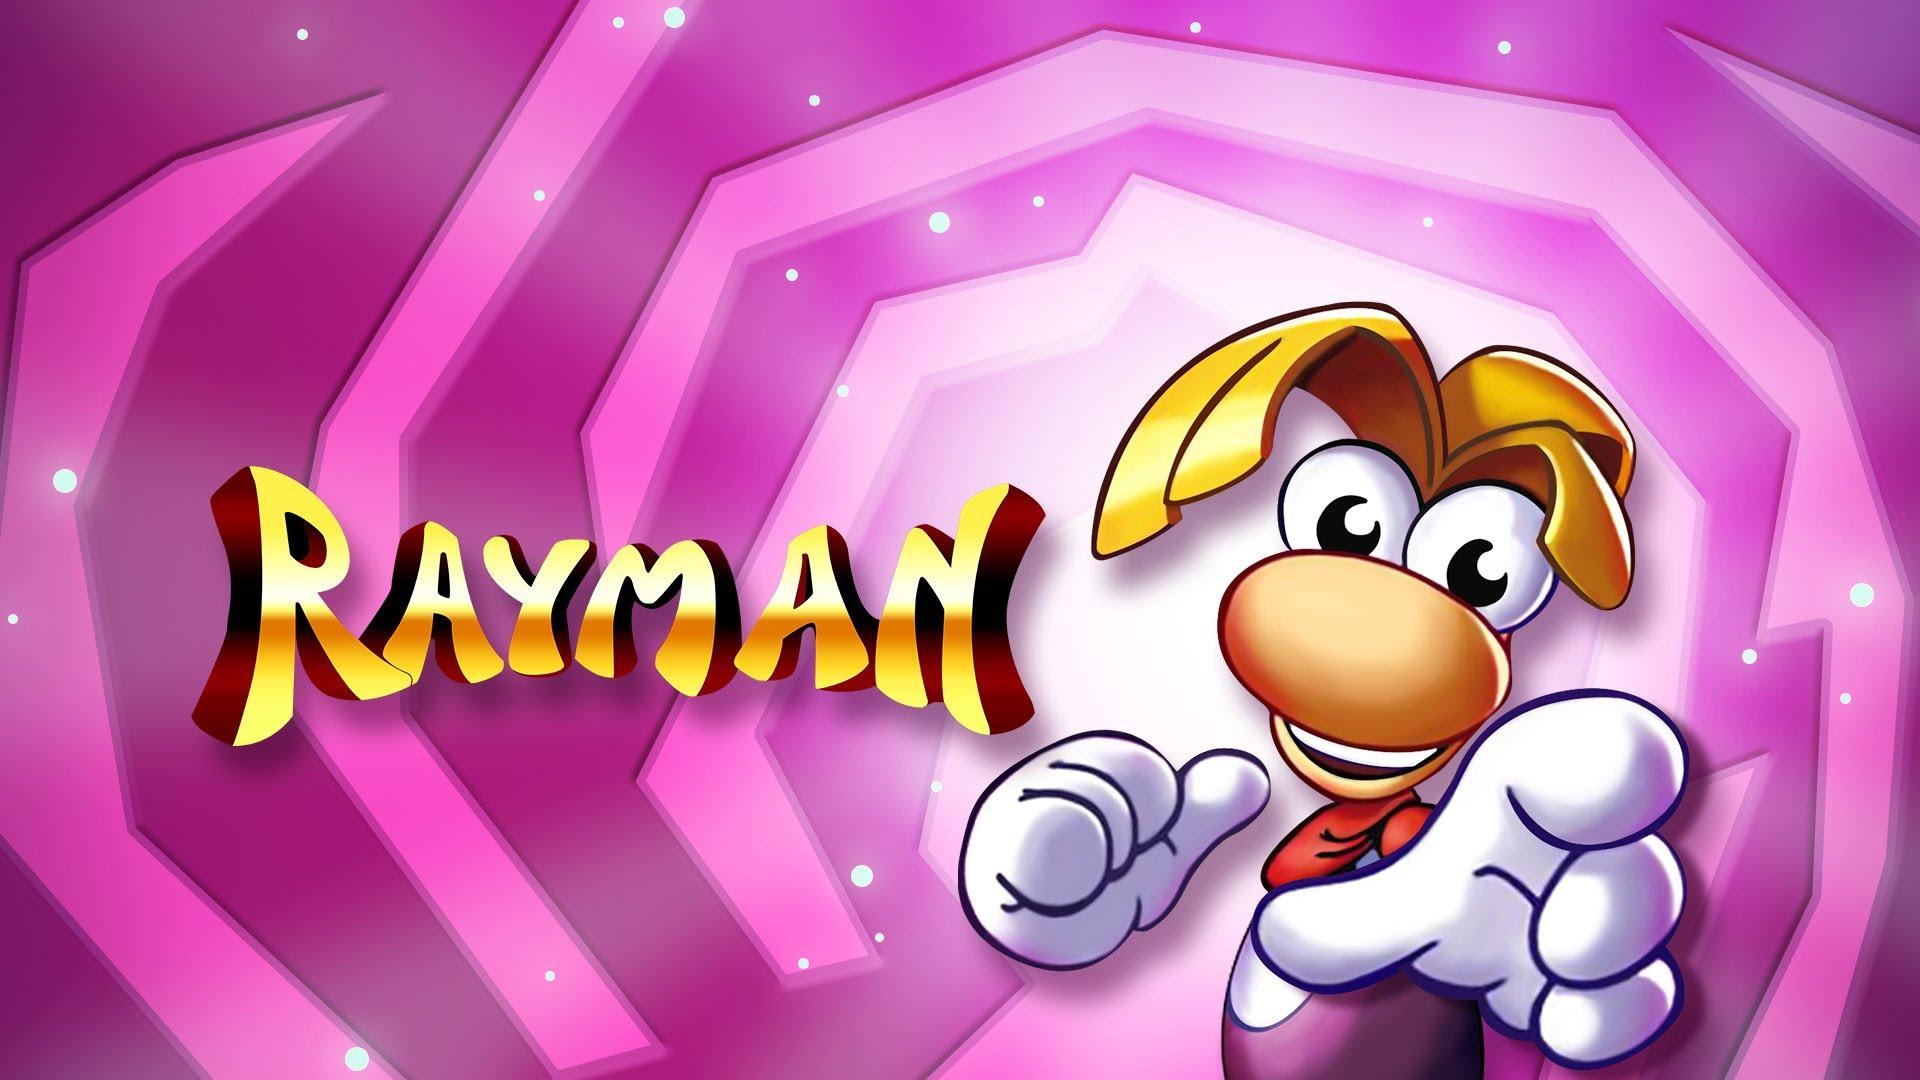 Rayman Classic Oyunu App store'da ÜCRETSİZ